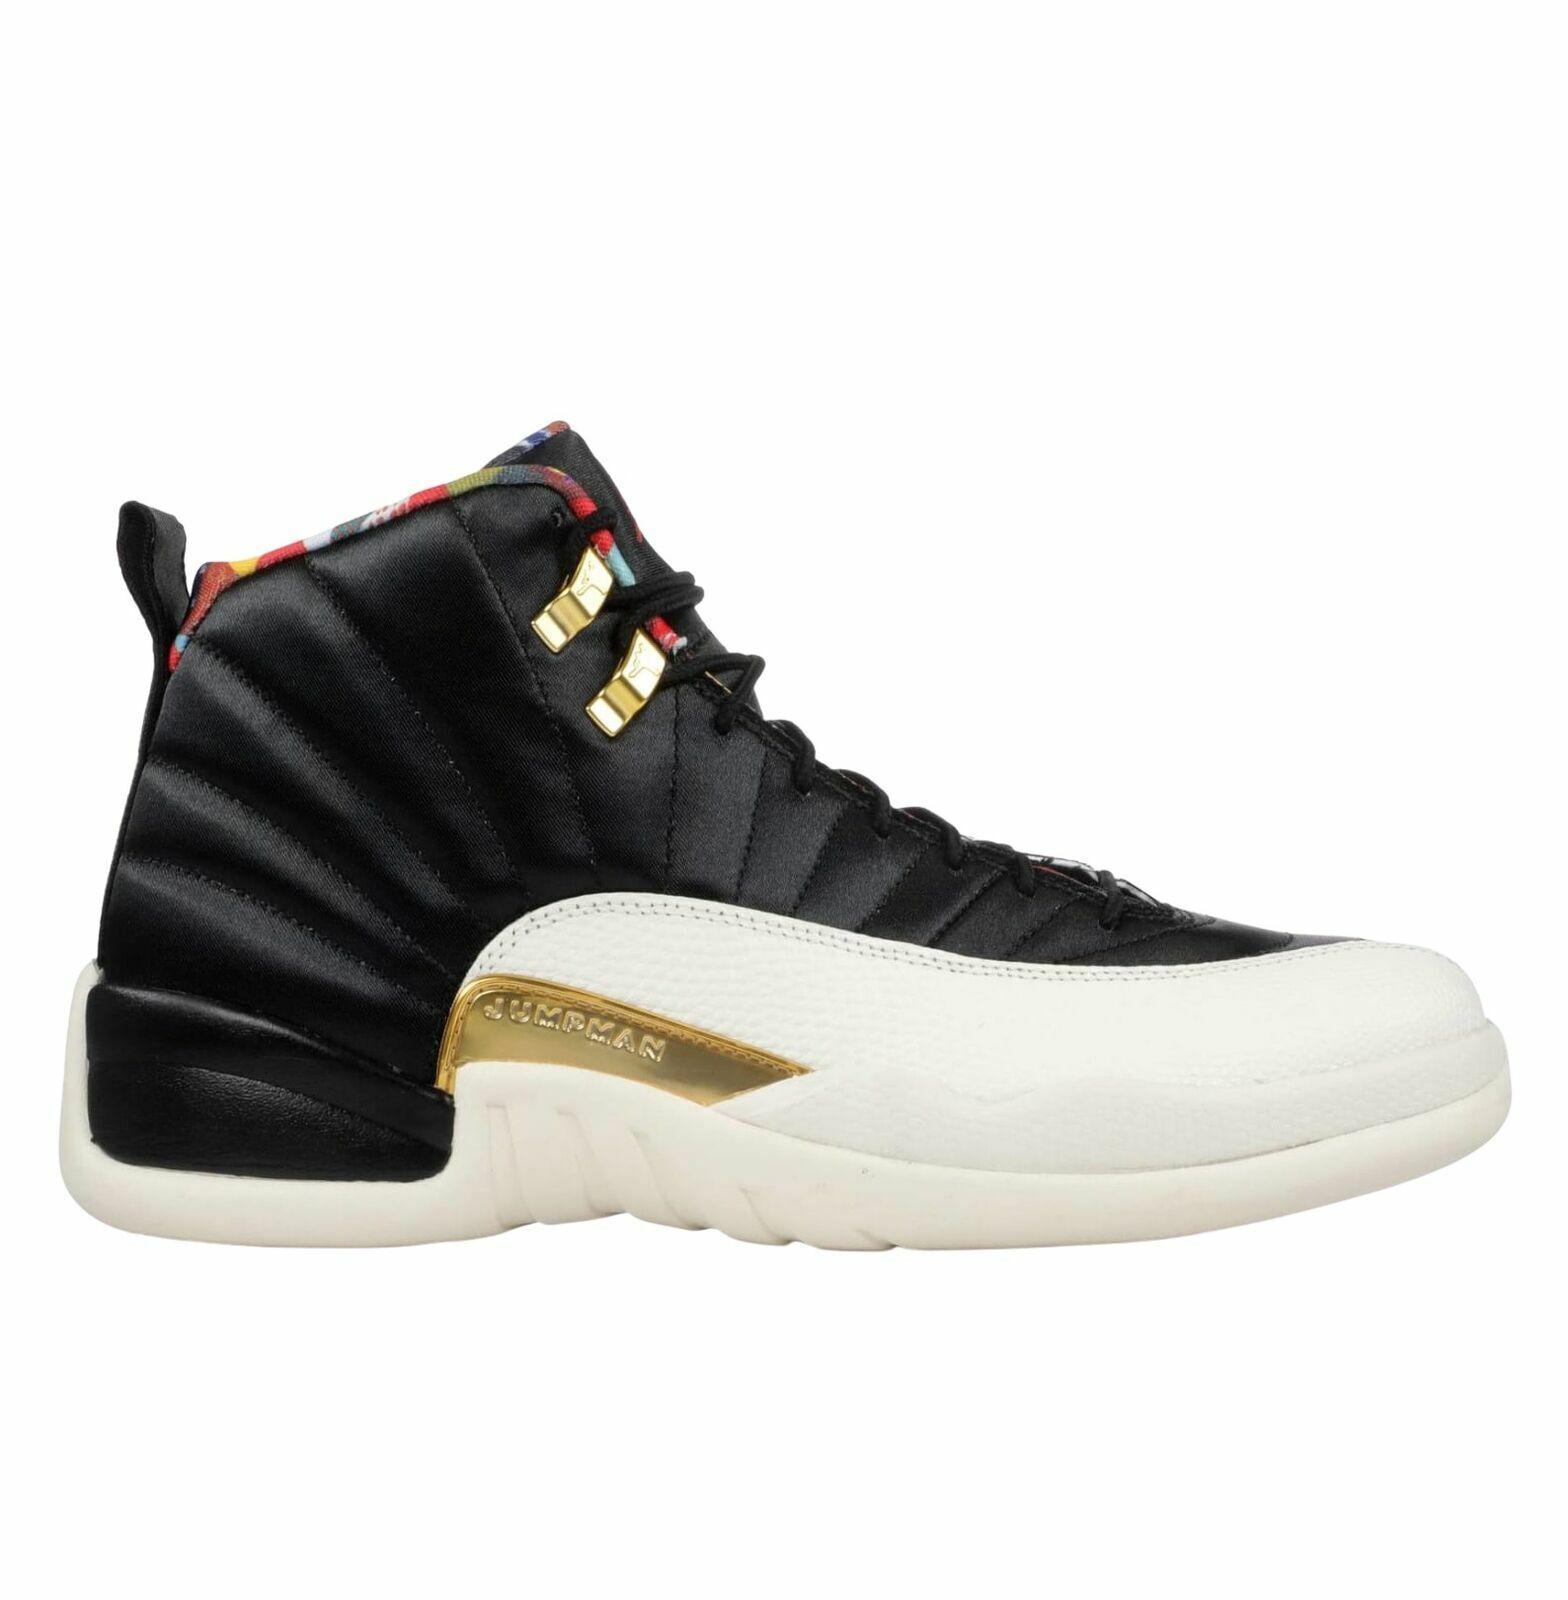 Size 9.5 - Jordan 12 Retro Chinese New Year 2019